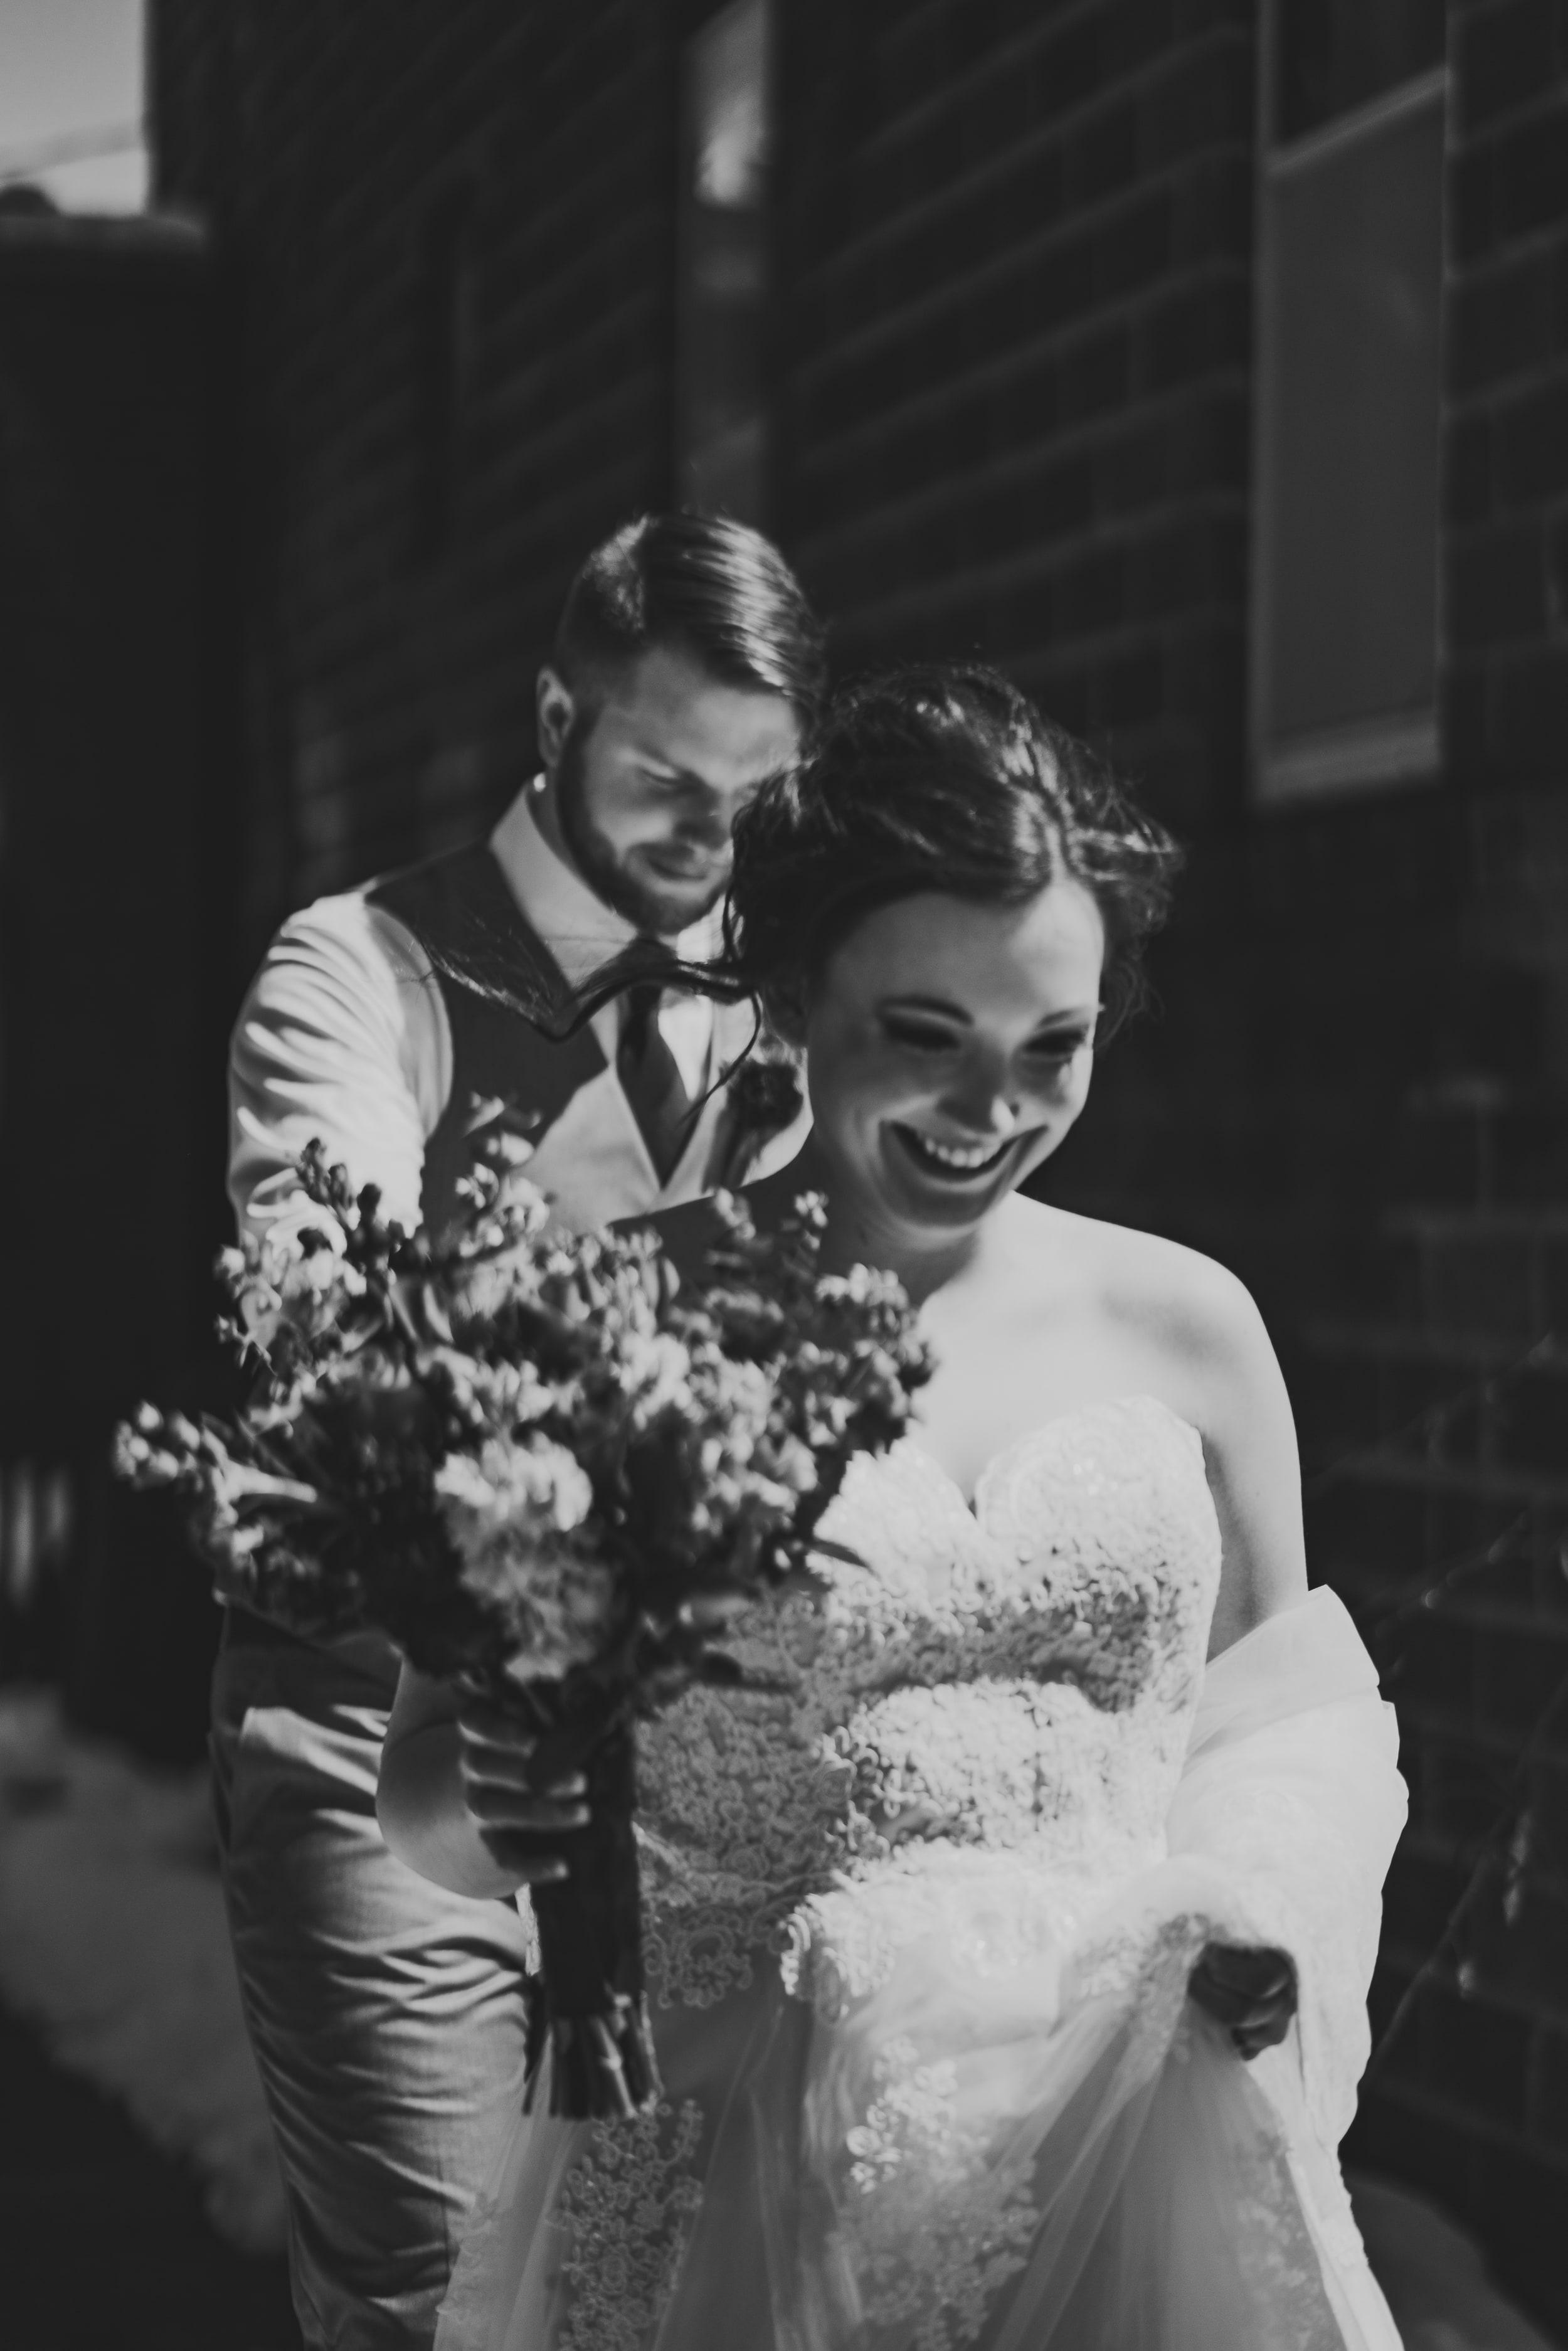 snowy-intimate-wedding-14.jpg